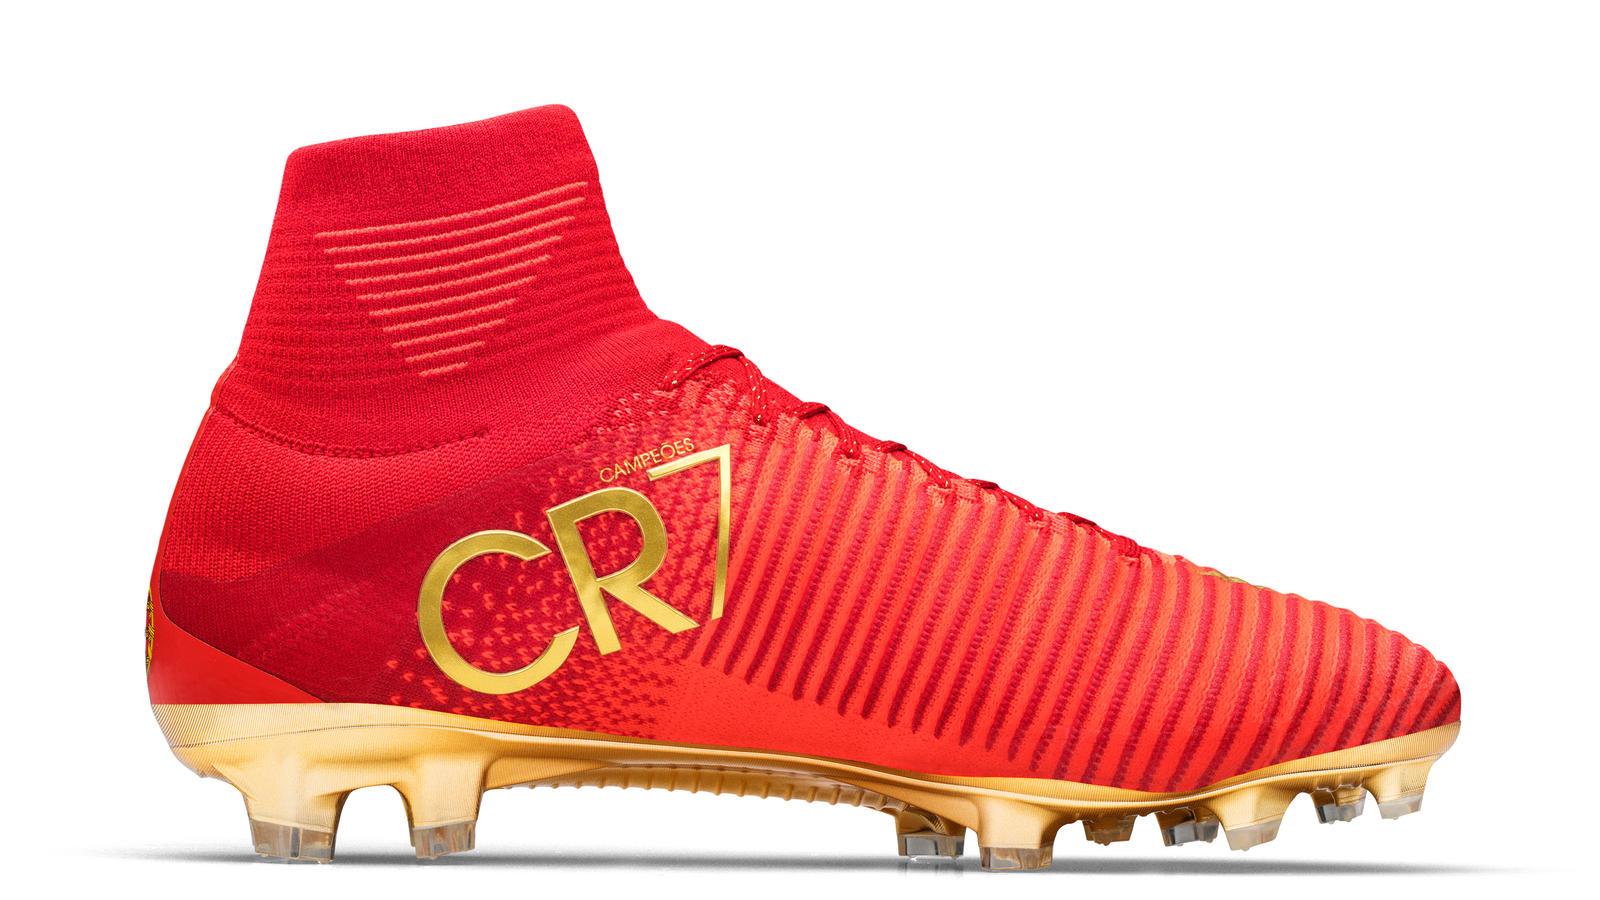 sports cristiano ronaldo to model new cr7 mercurial